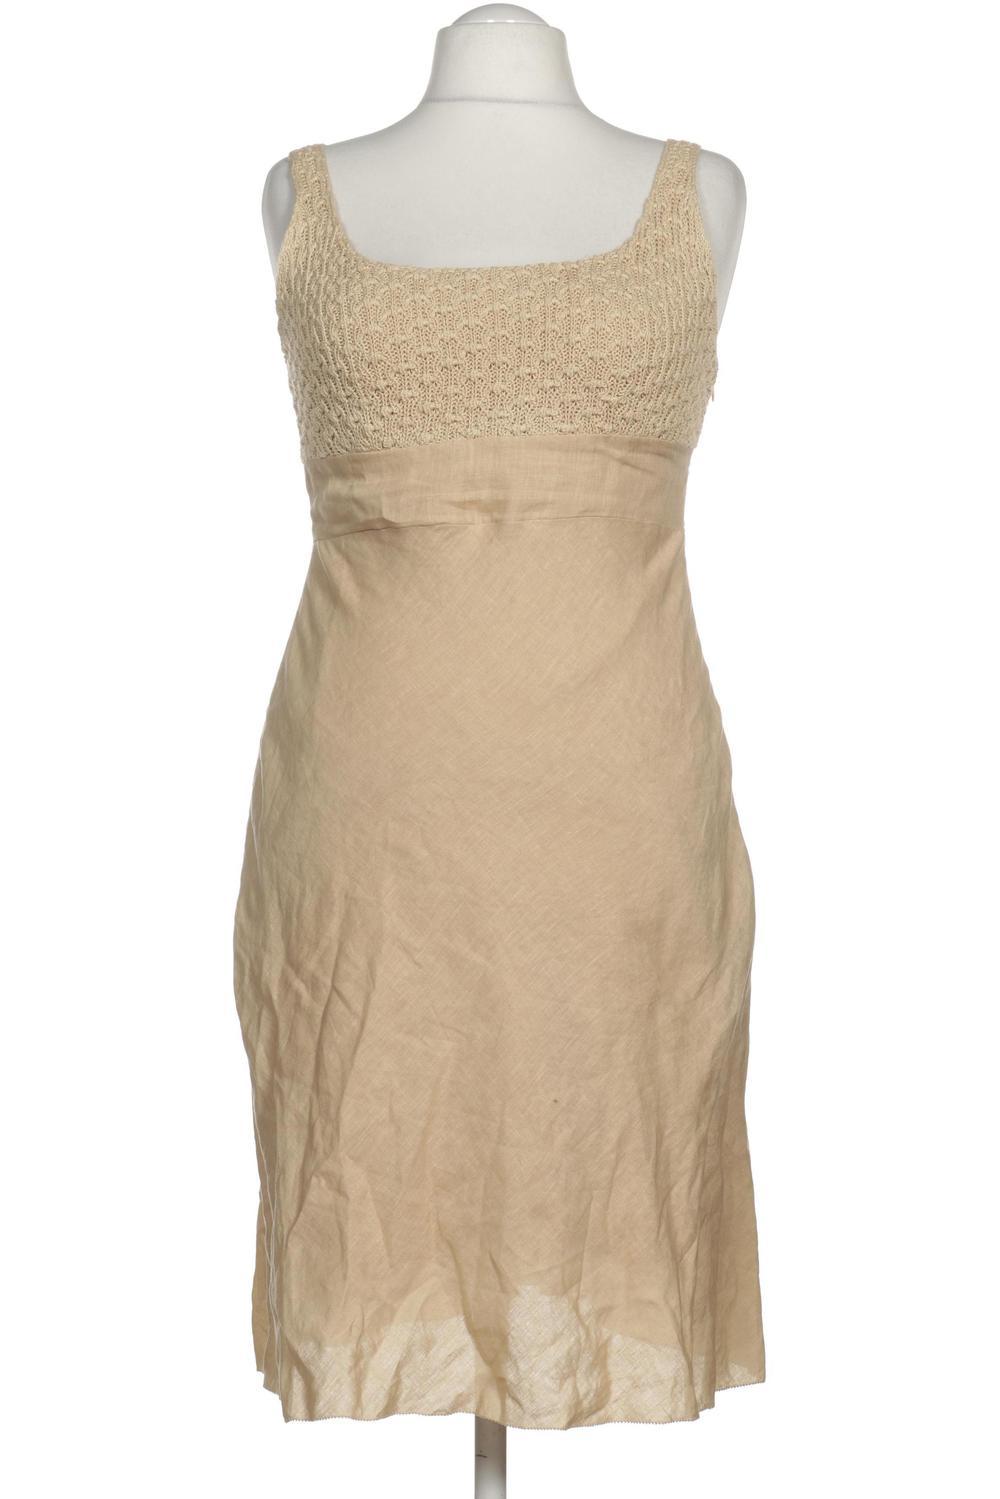 AGNONA Kleid Damen Dress Damenkleid Gr. DE 46 Baumwolle ...